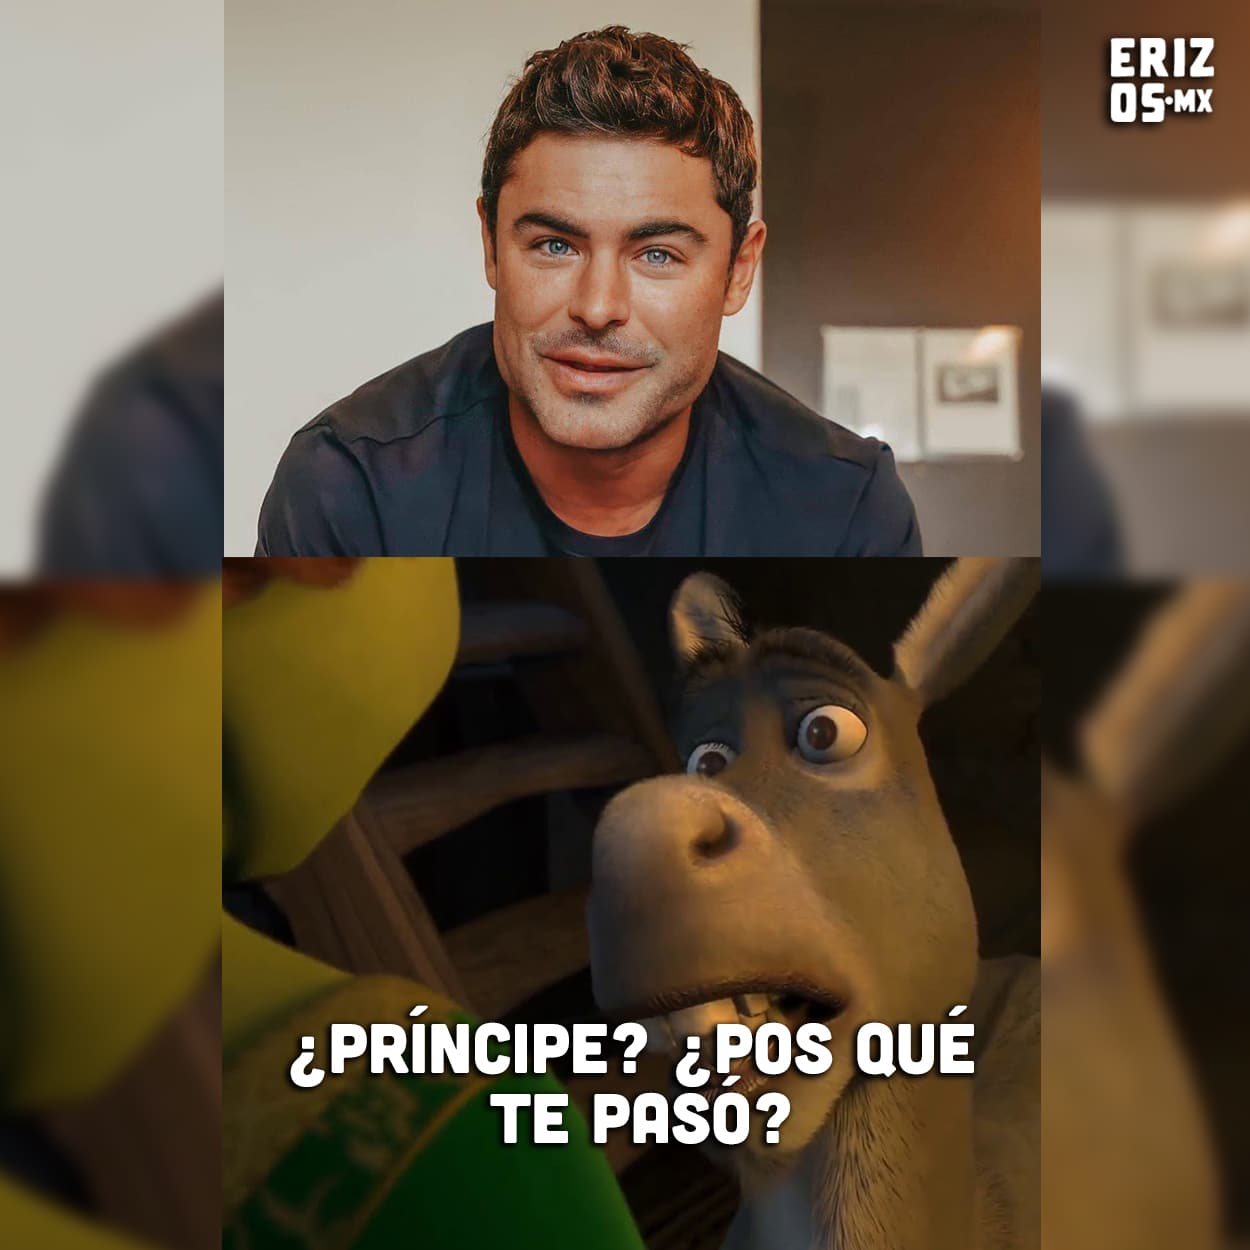 Meme de Zac Efron con el burro de Shrek